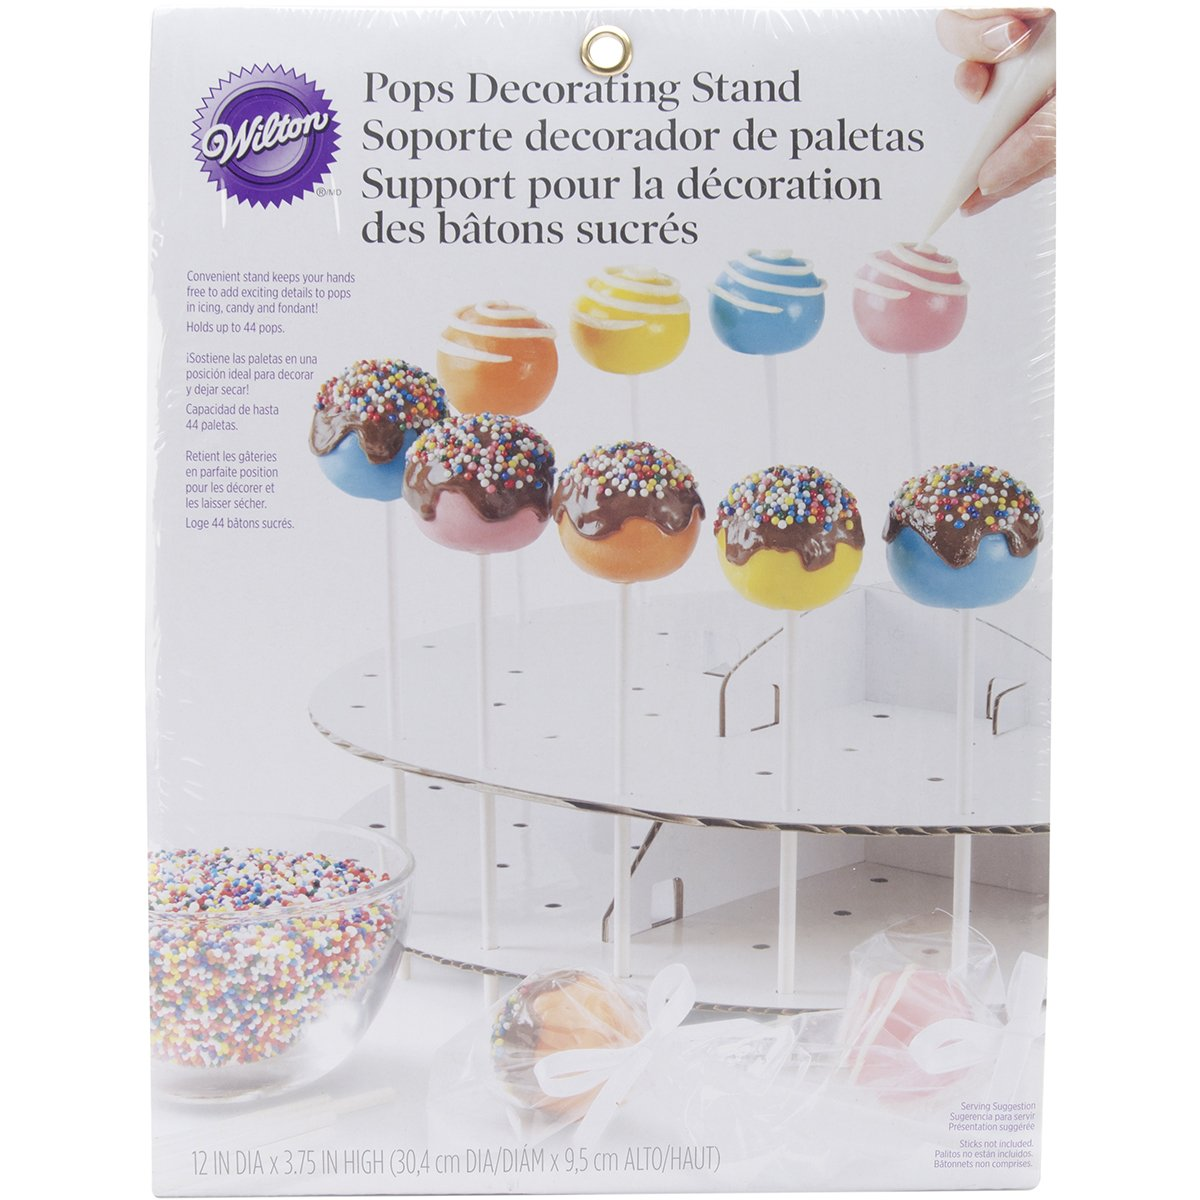 Wilton 1512-136 - Expositor/Stand para decorar/presentar cakepops: Amazon.es: Hogar